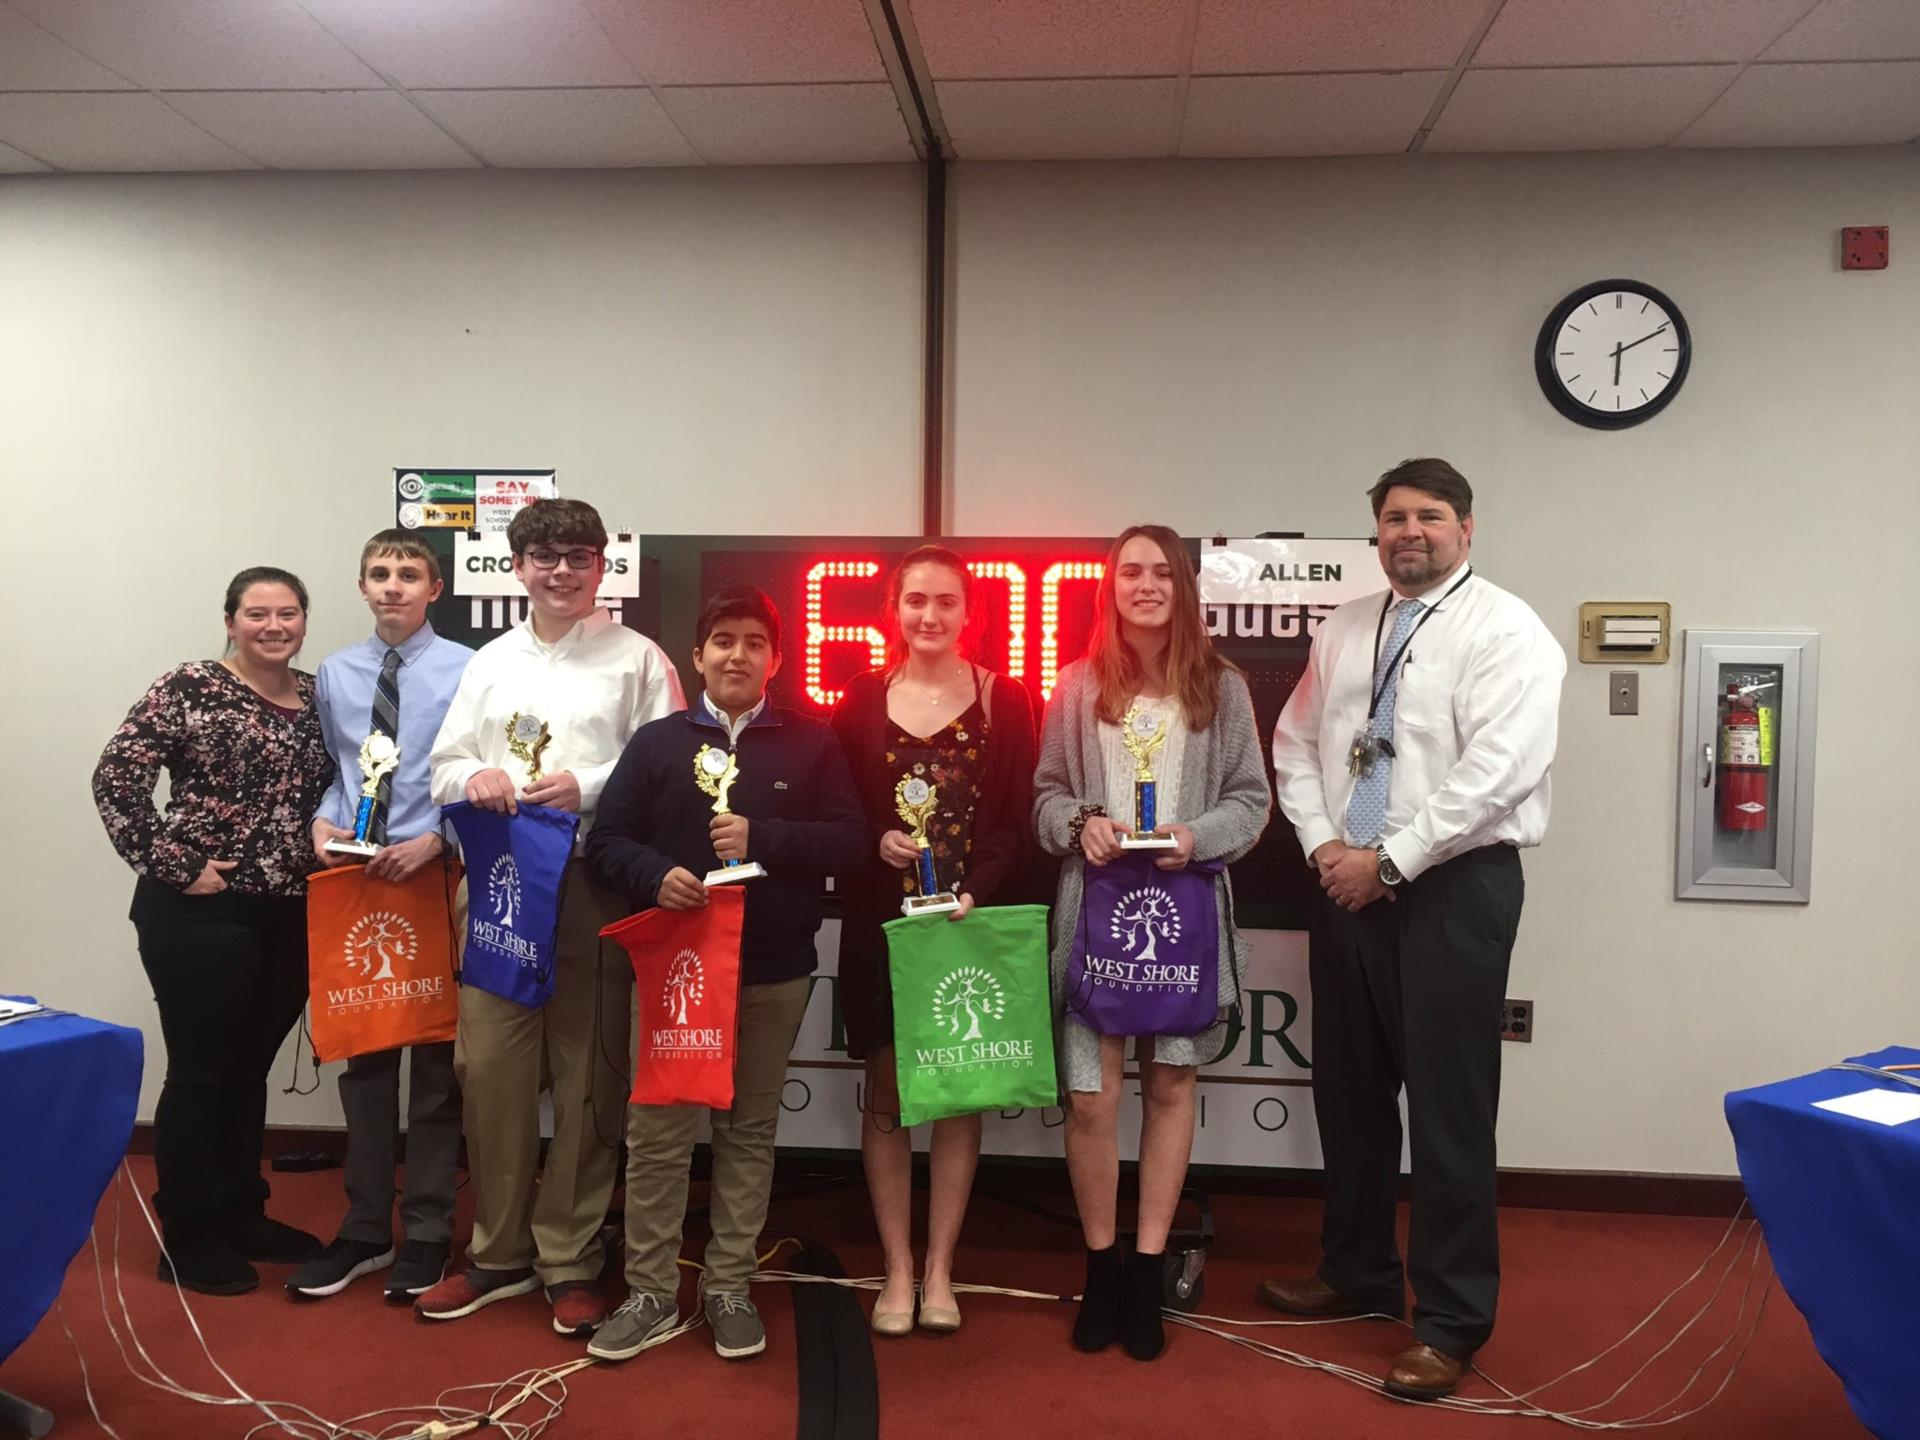 allen eighth grade winners